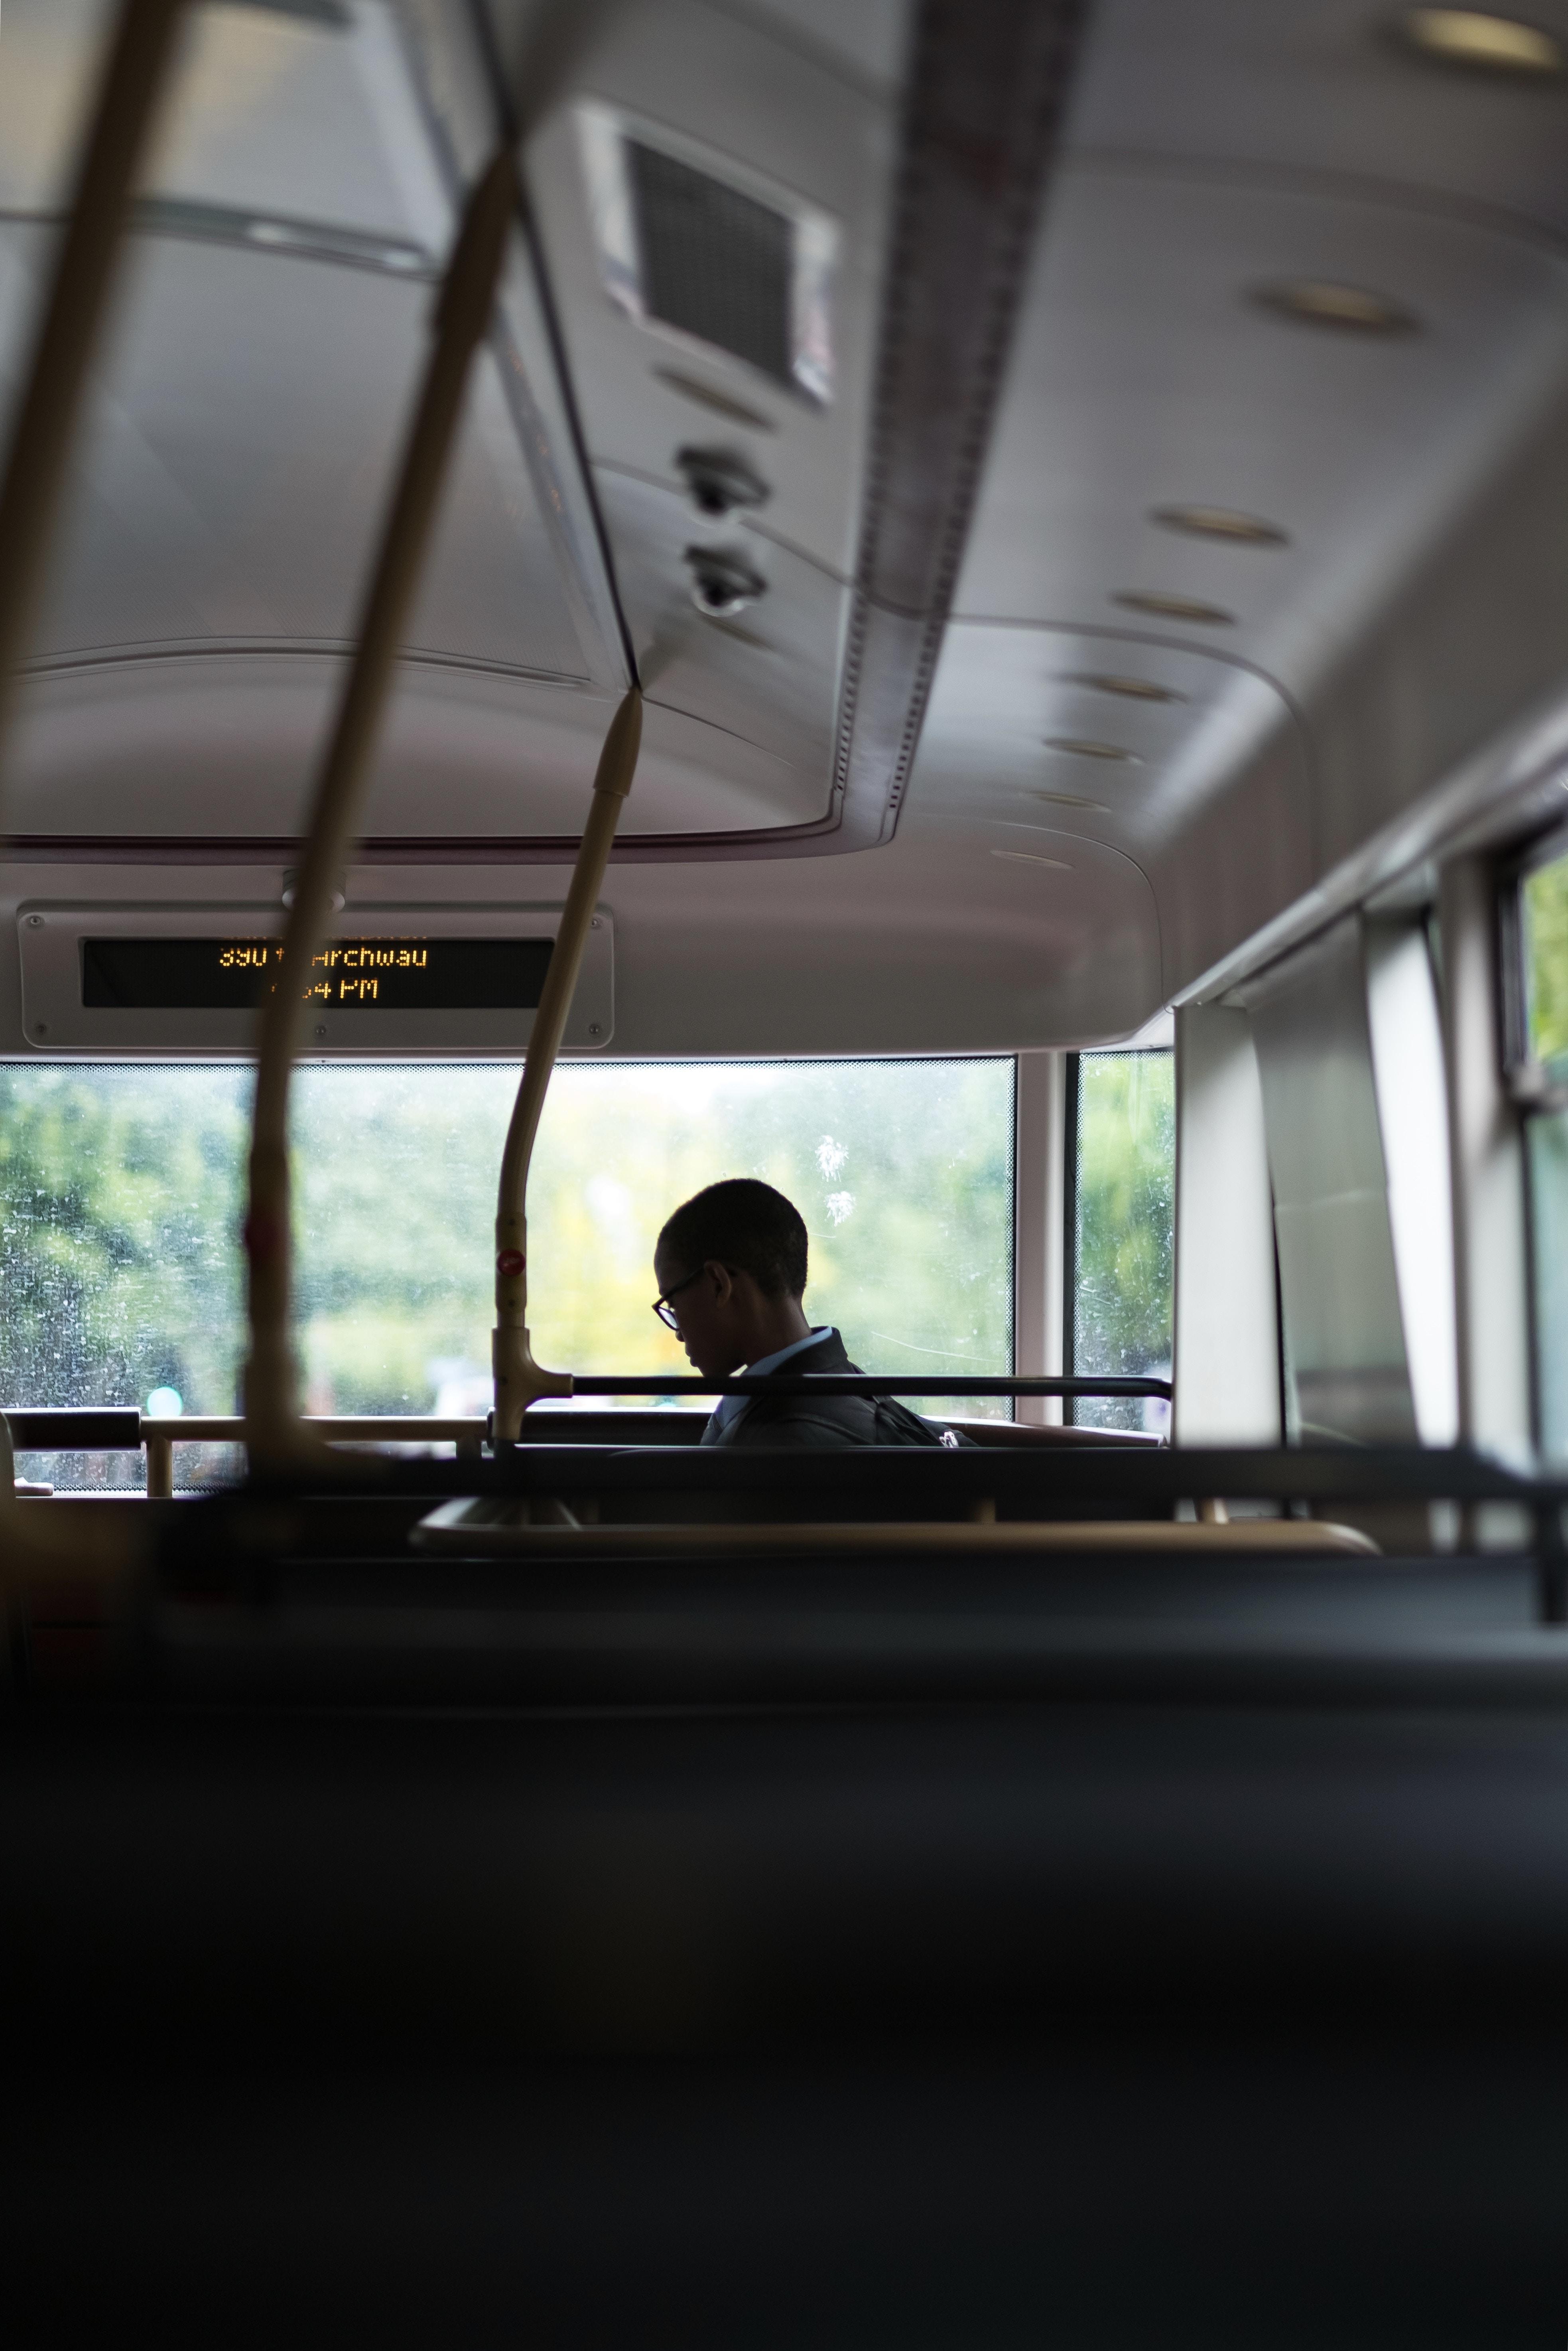 boy inside the bus